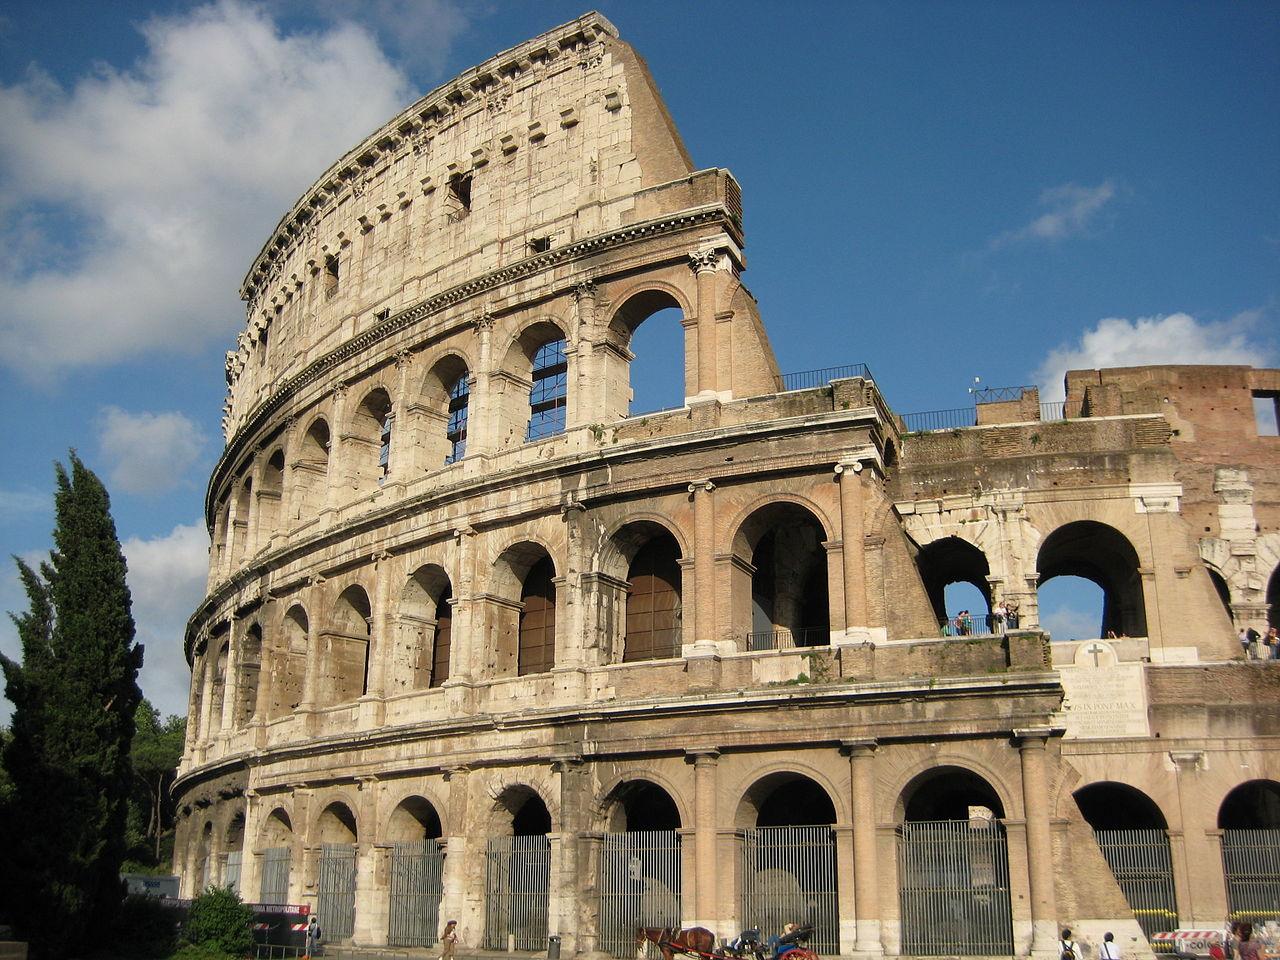 File:Colosseum, Rome, Wts.jpg